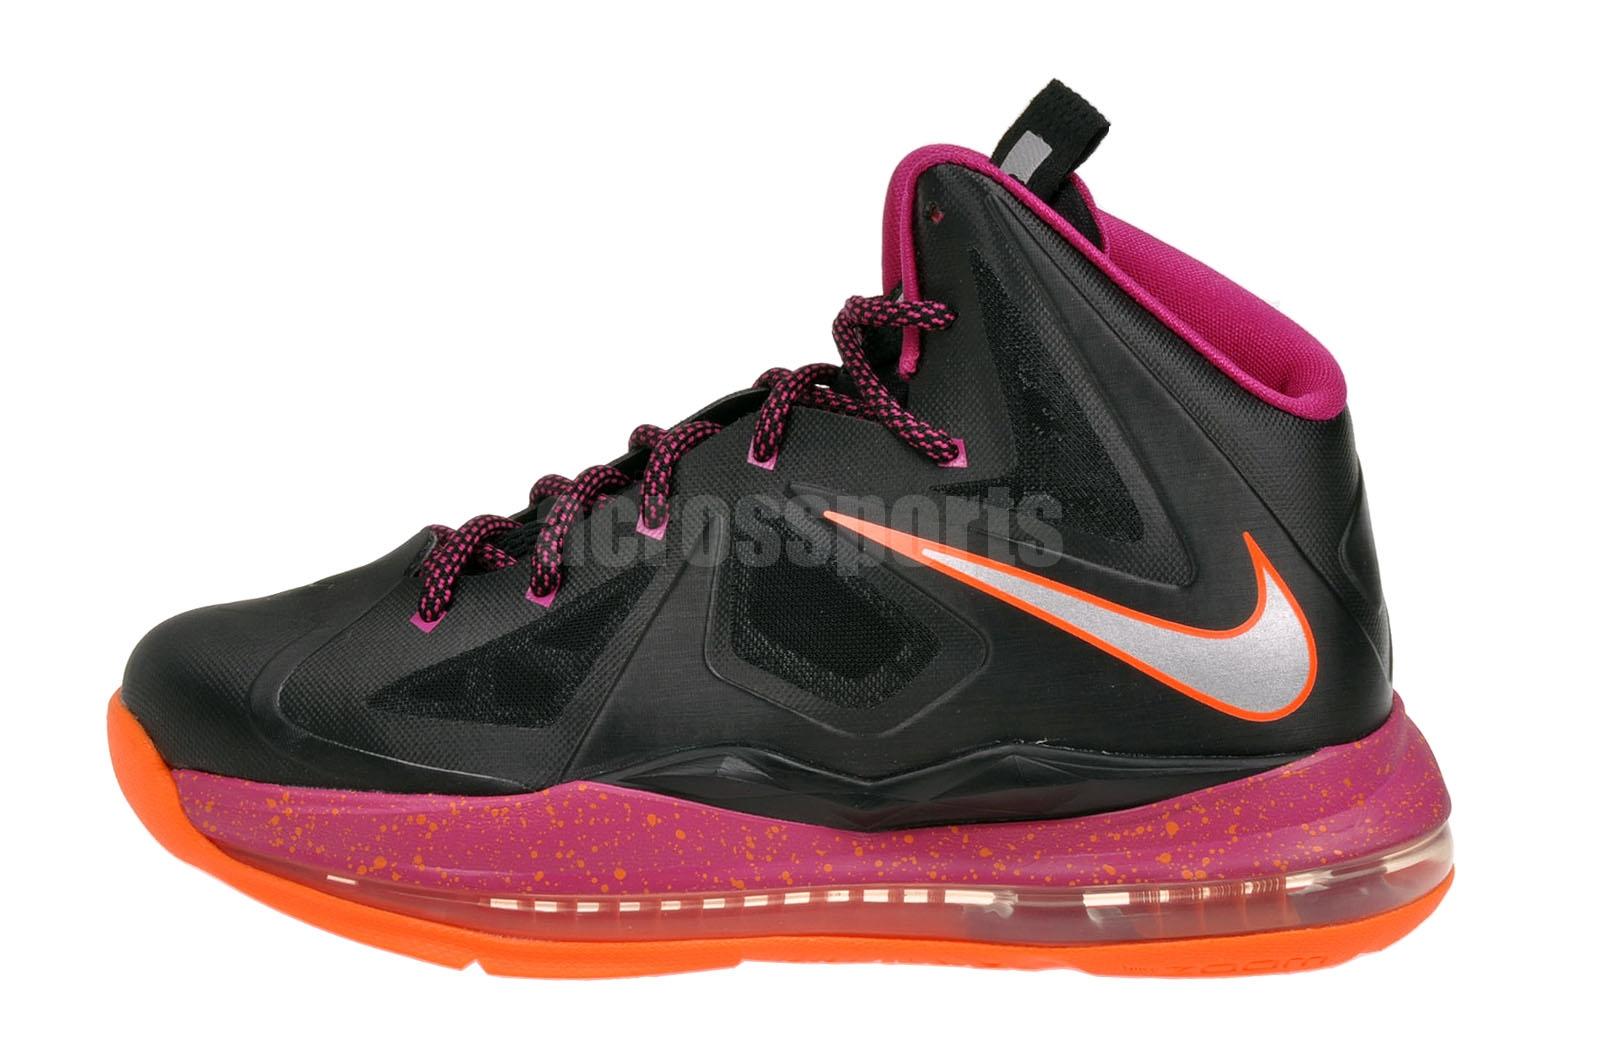 hot sale online 8ca65 127ef Lebron 10 Boys 4.5 Nike Air Force 1 Usa 525317 | CONMEBOL